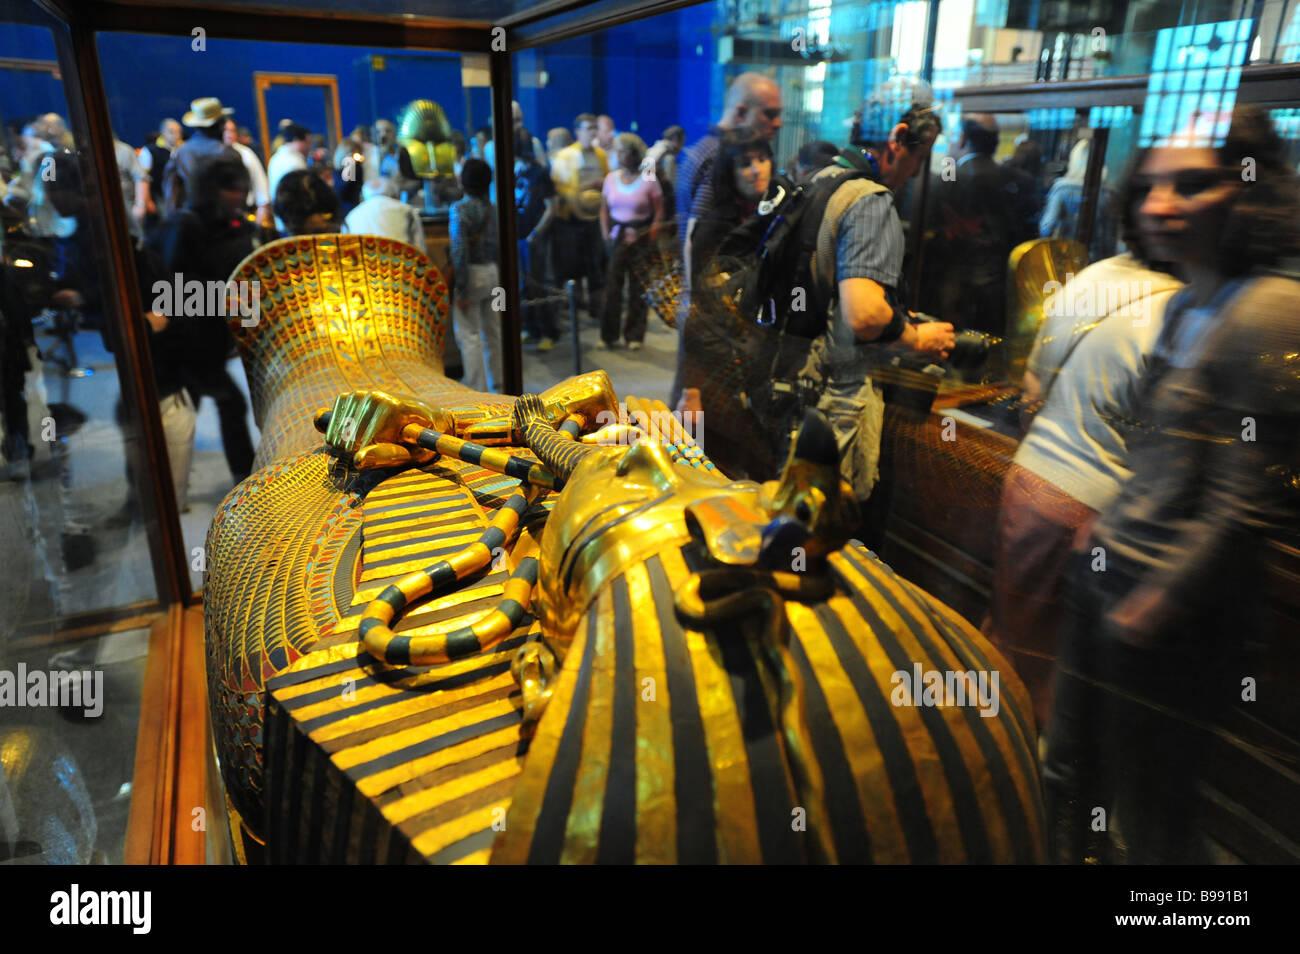 egypt-cairo-the-egyptian-museum-interior-museum-of-antiquities-and-B991B1.jpg